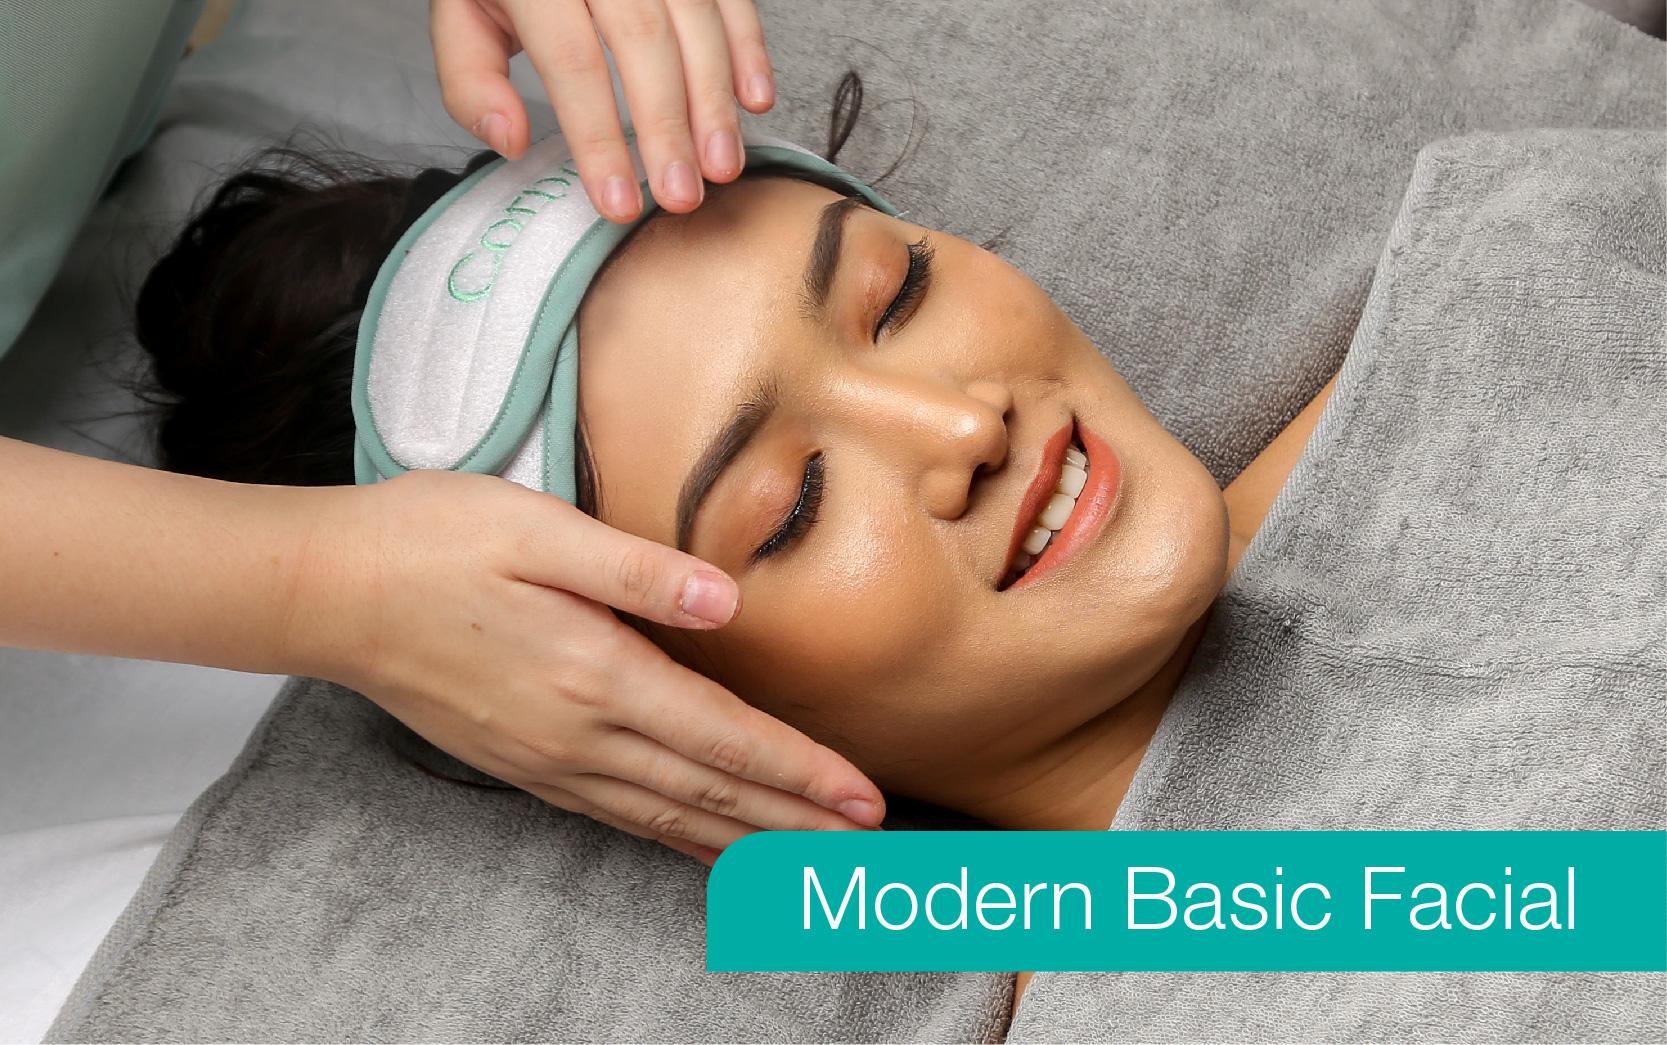 Corpoderma Modern Basic Facial